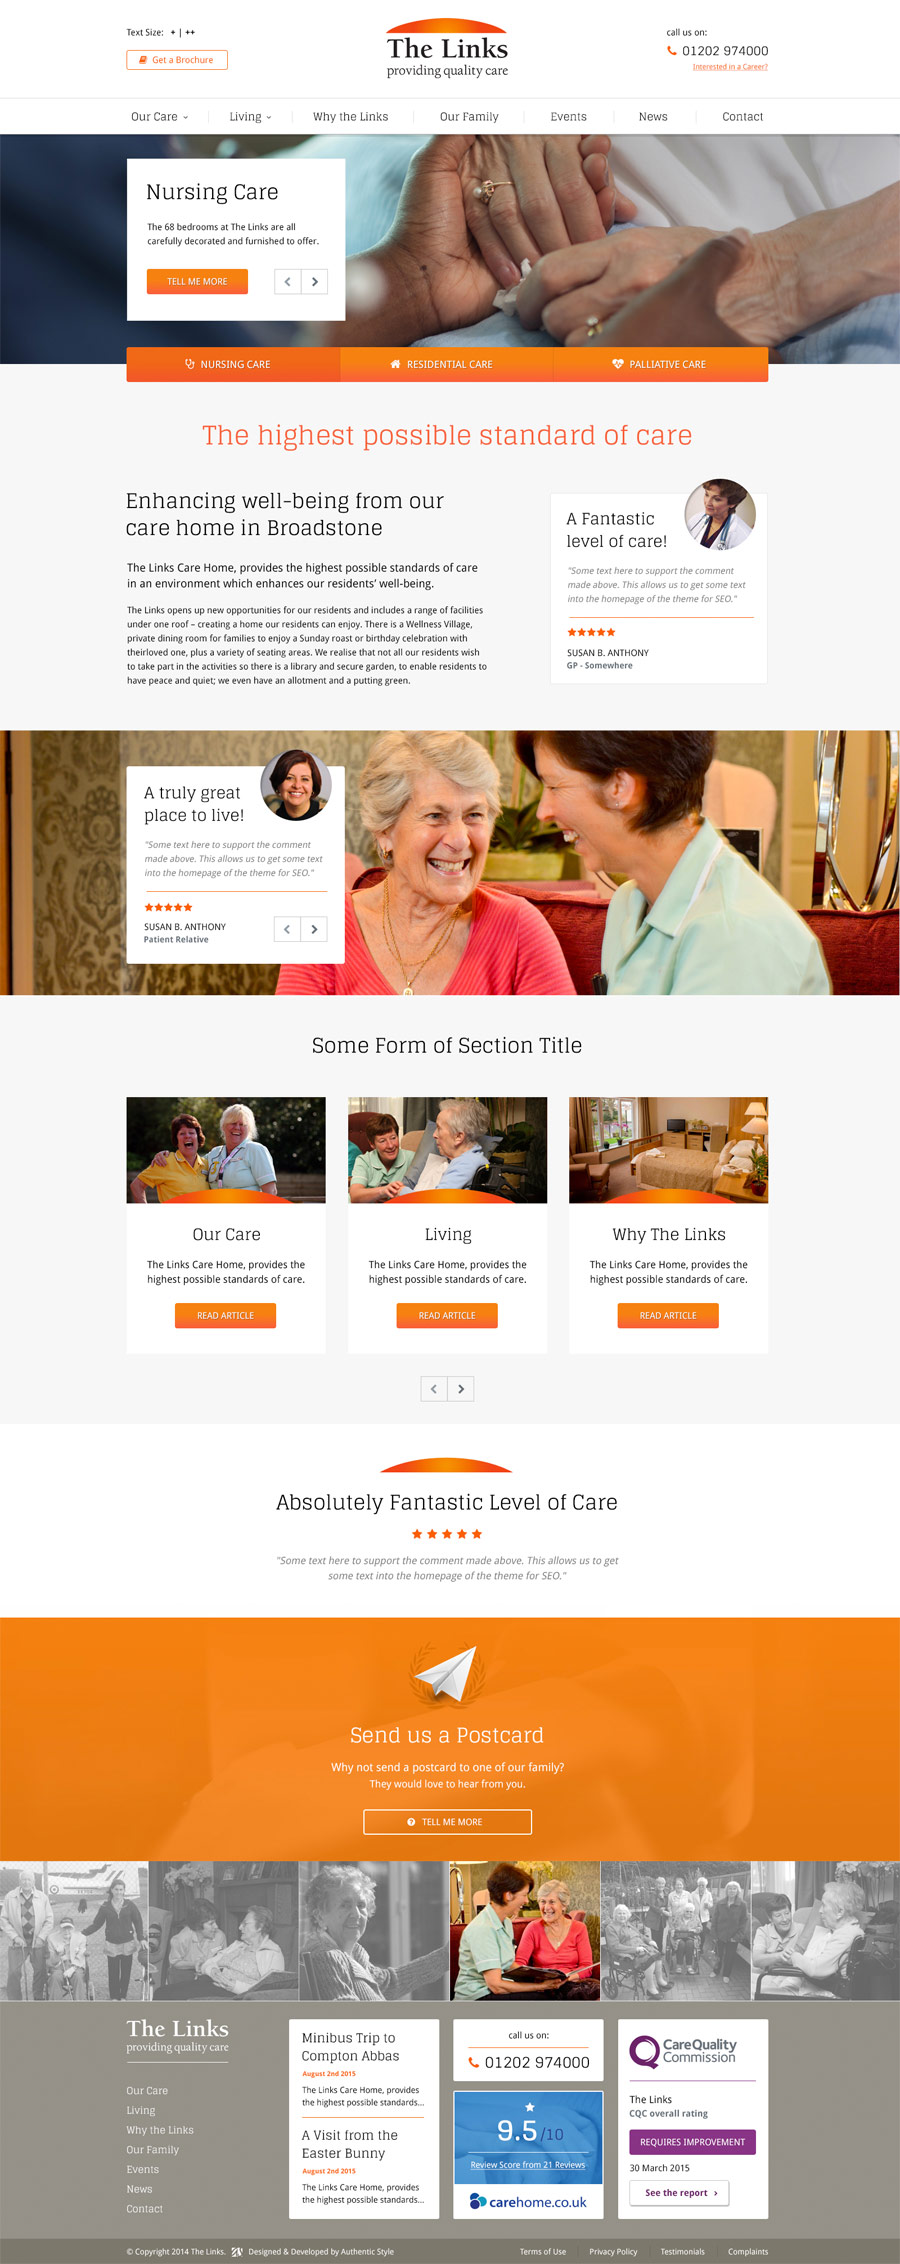 Awesome Care Home Website Design Photos - Amazing House Decorating ...